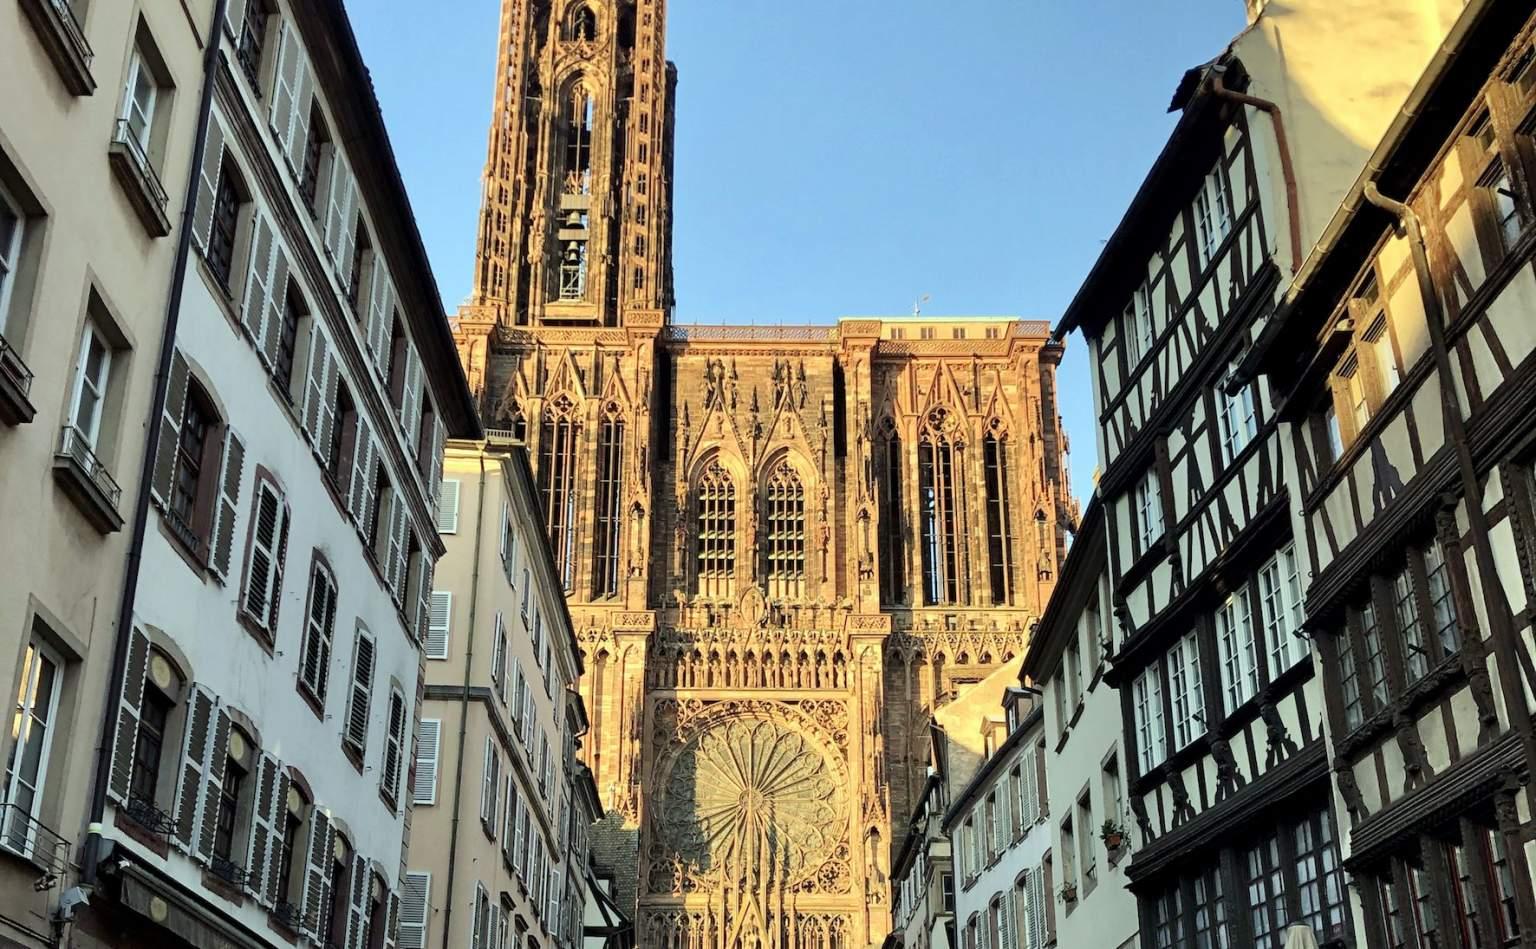 Strasbourg La Belle Diana hotels Collection